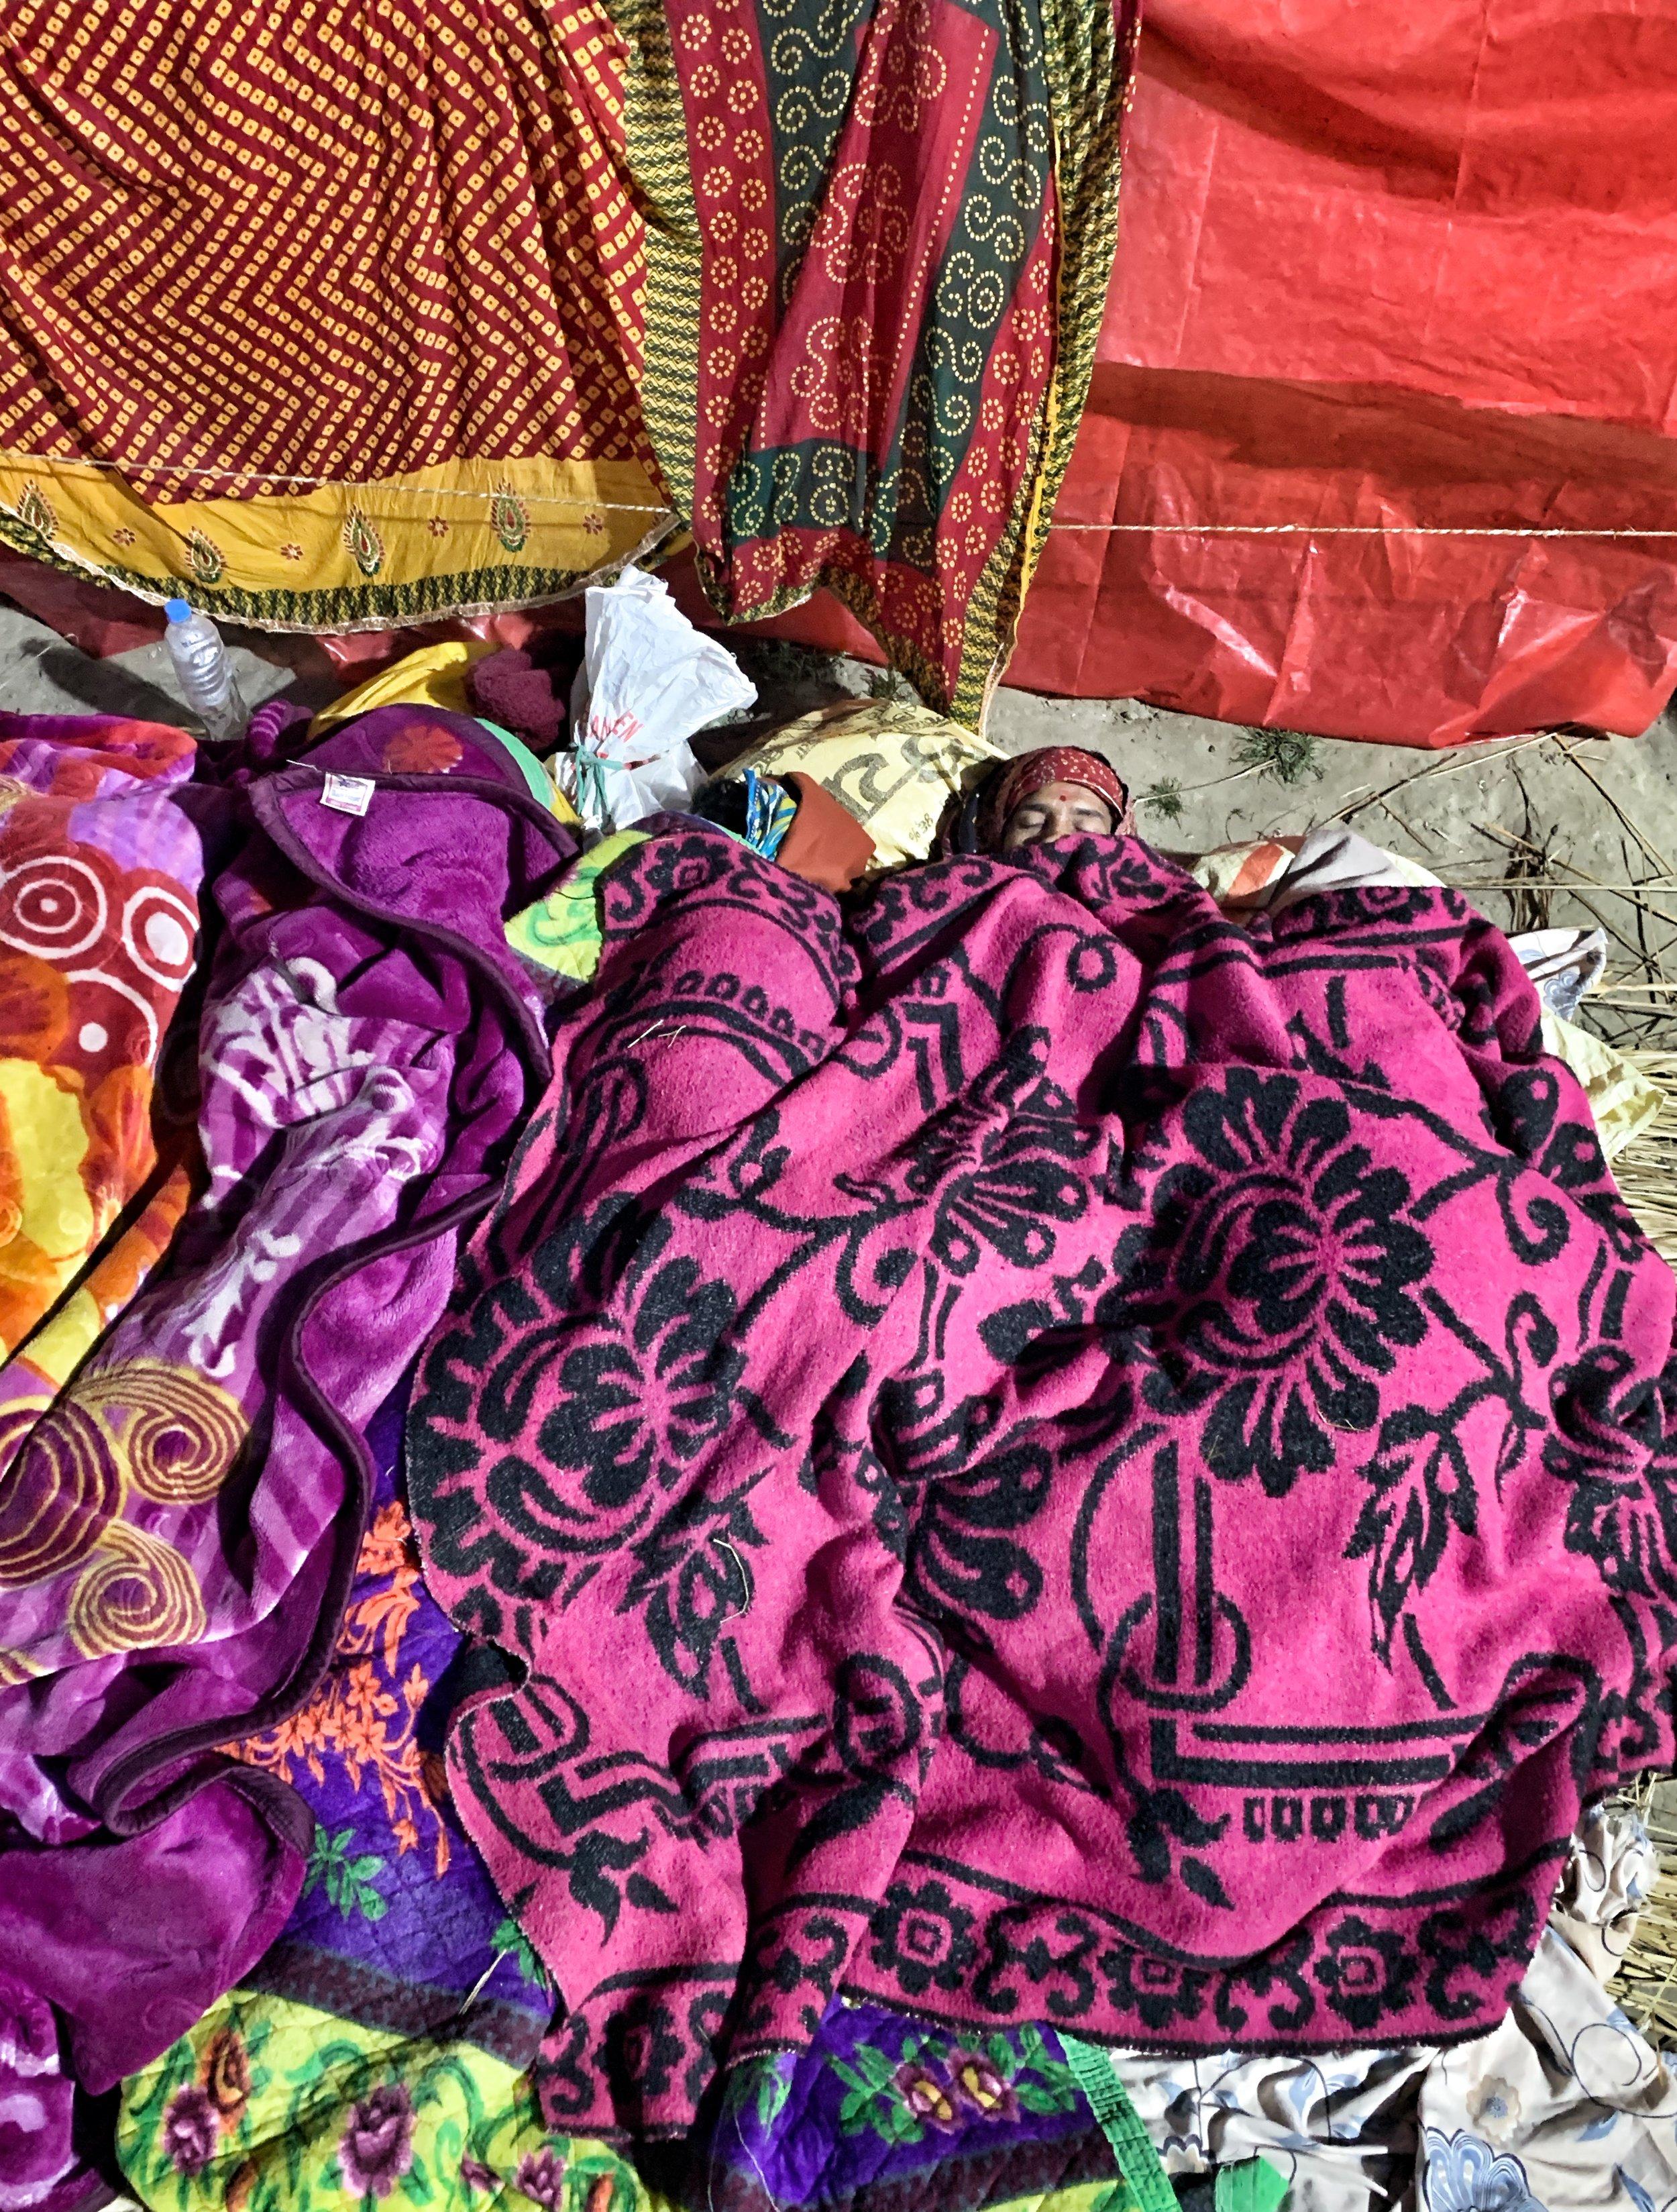 Man sleeps in an ocean of colored fabrics.